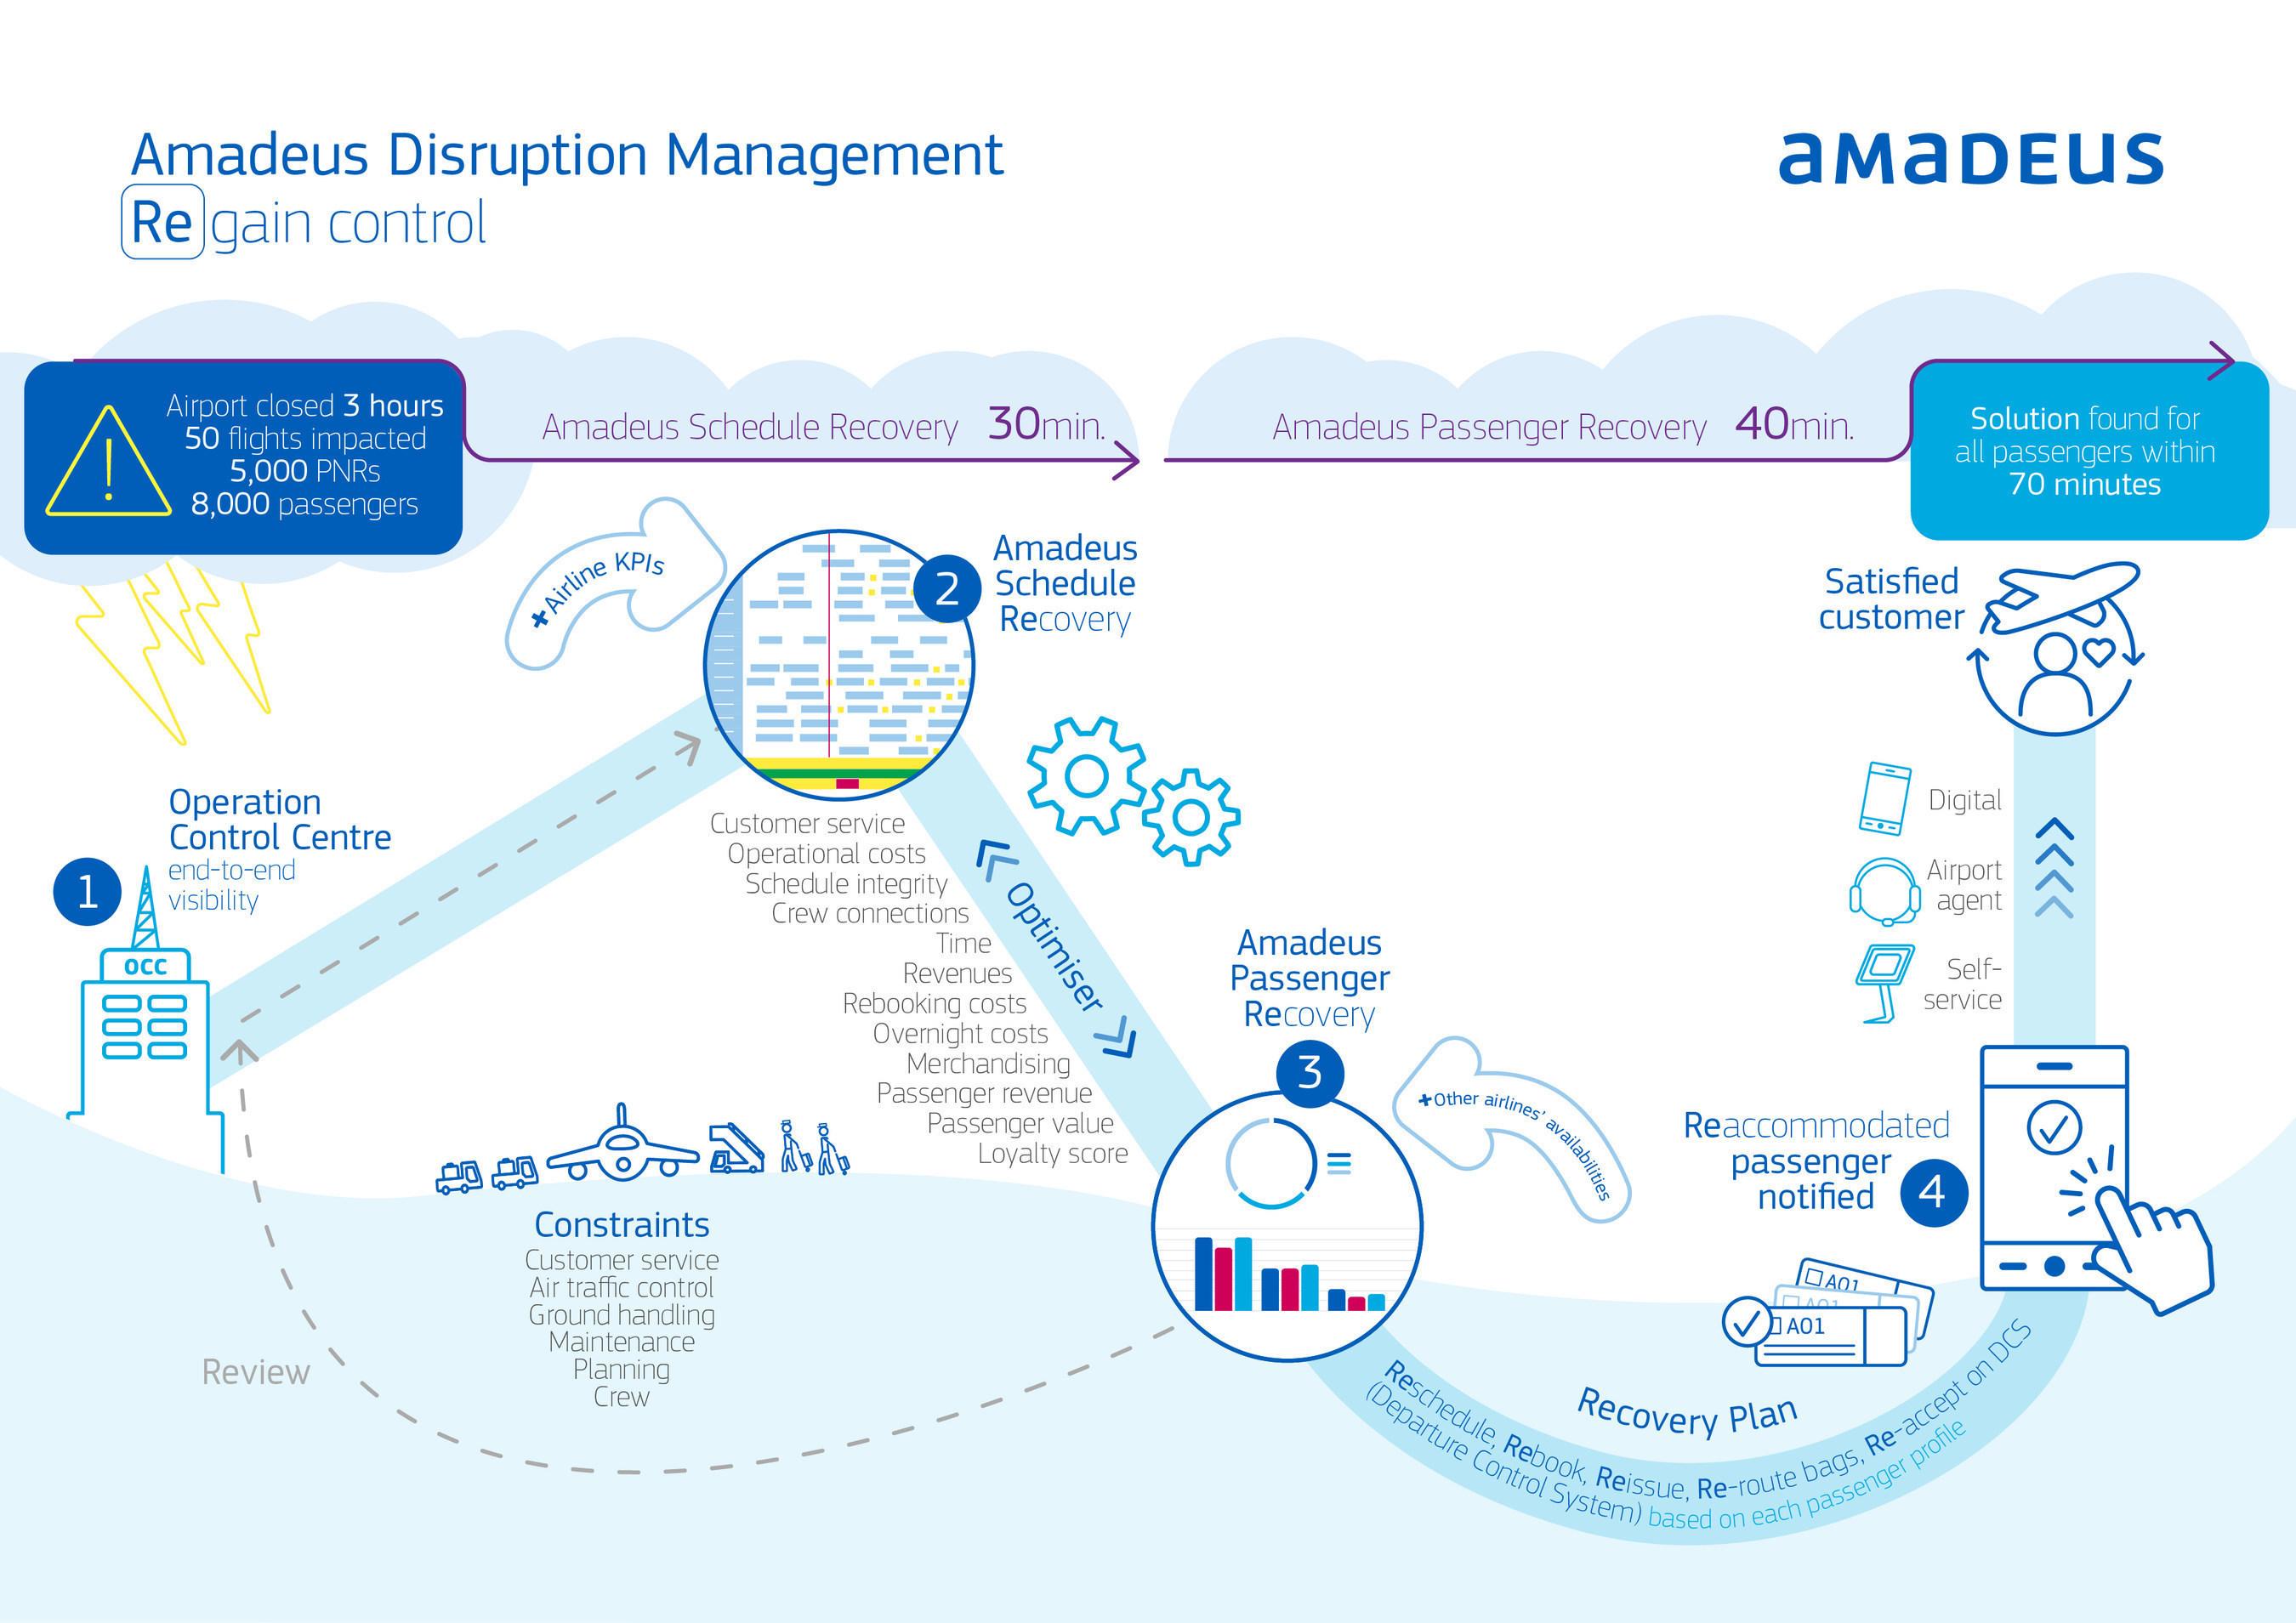 Amadeus Disruption Management: Regain Control